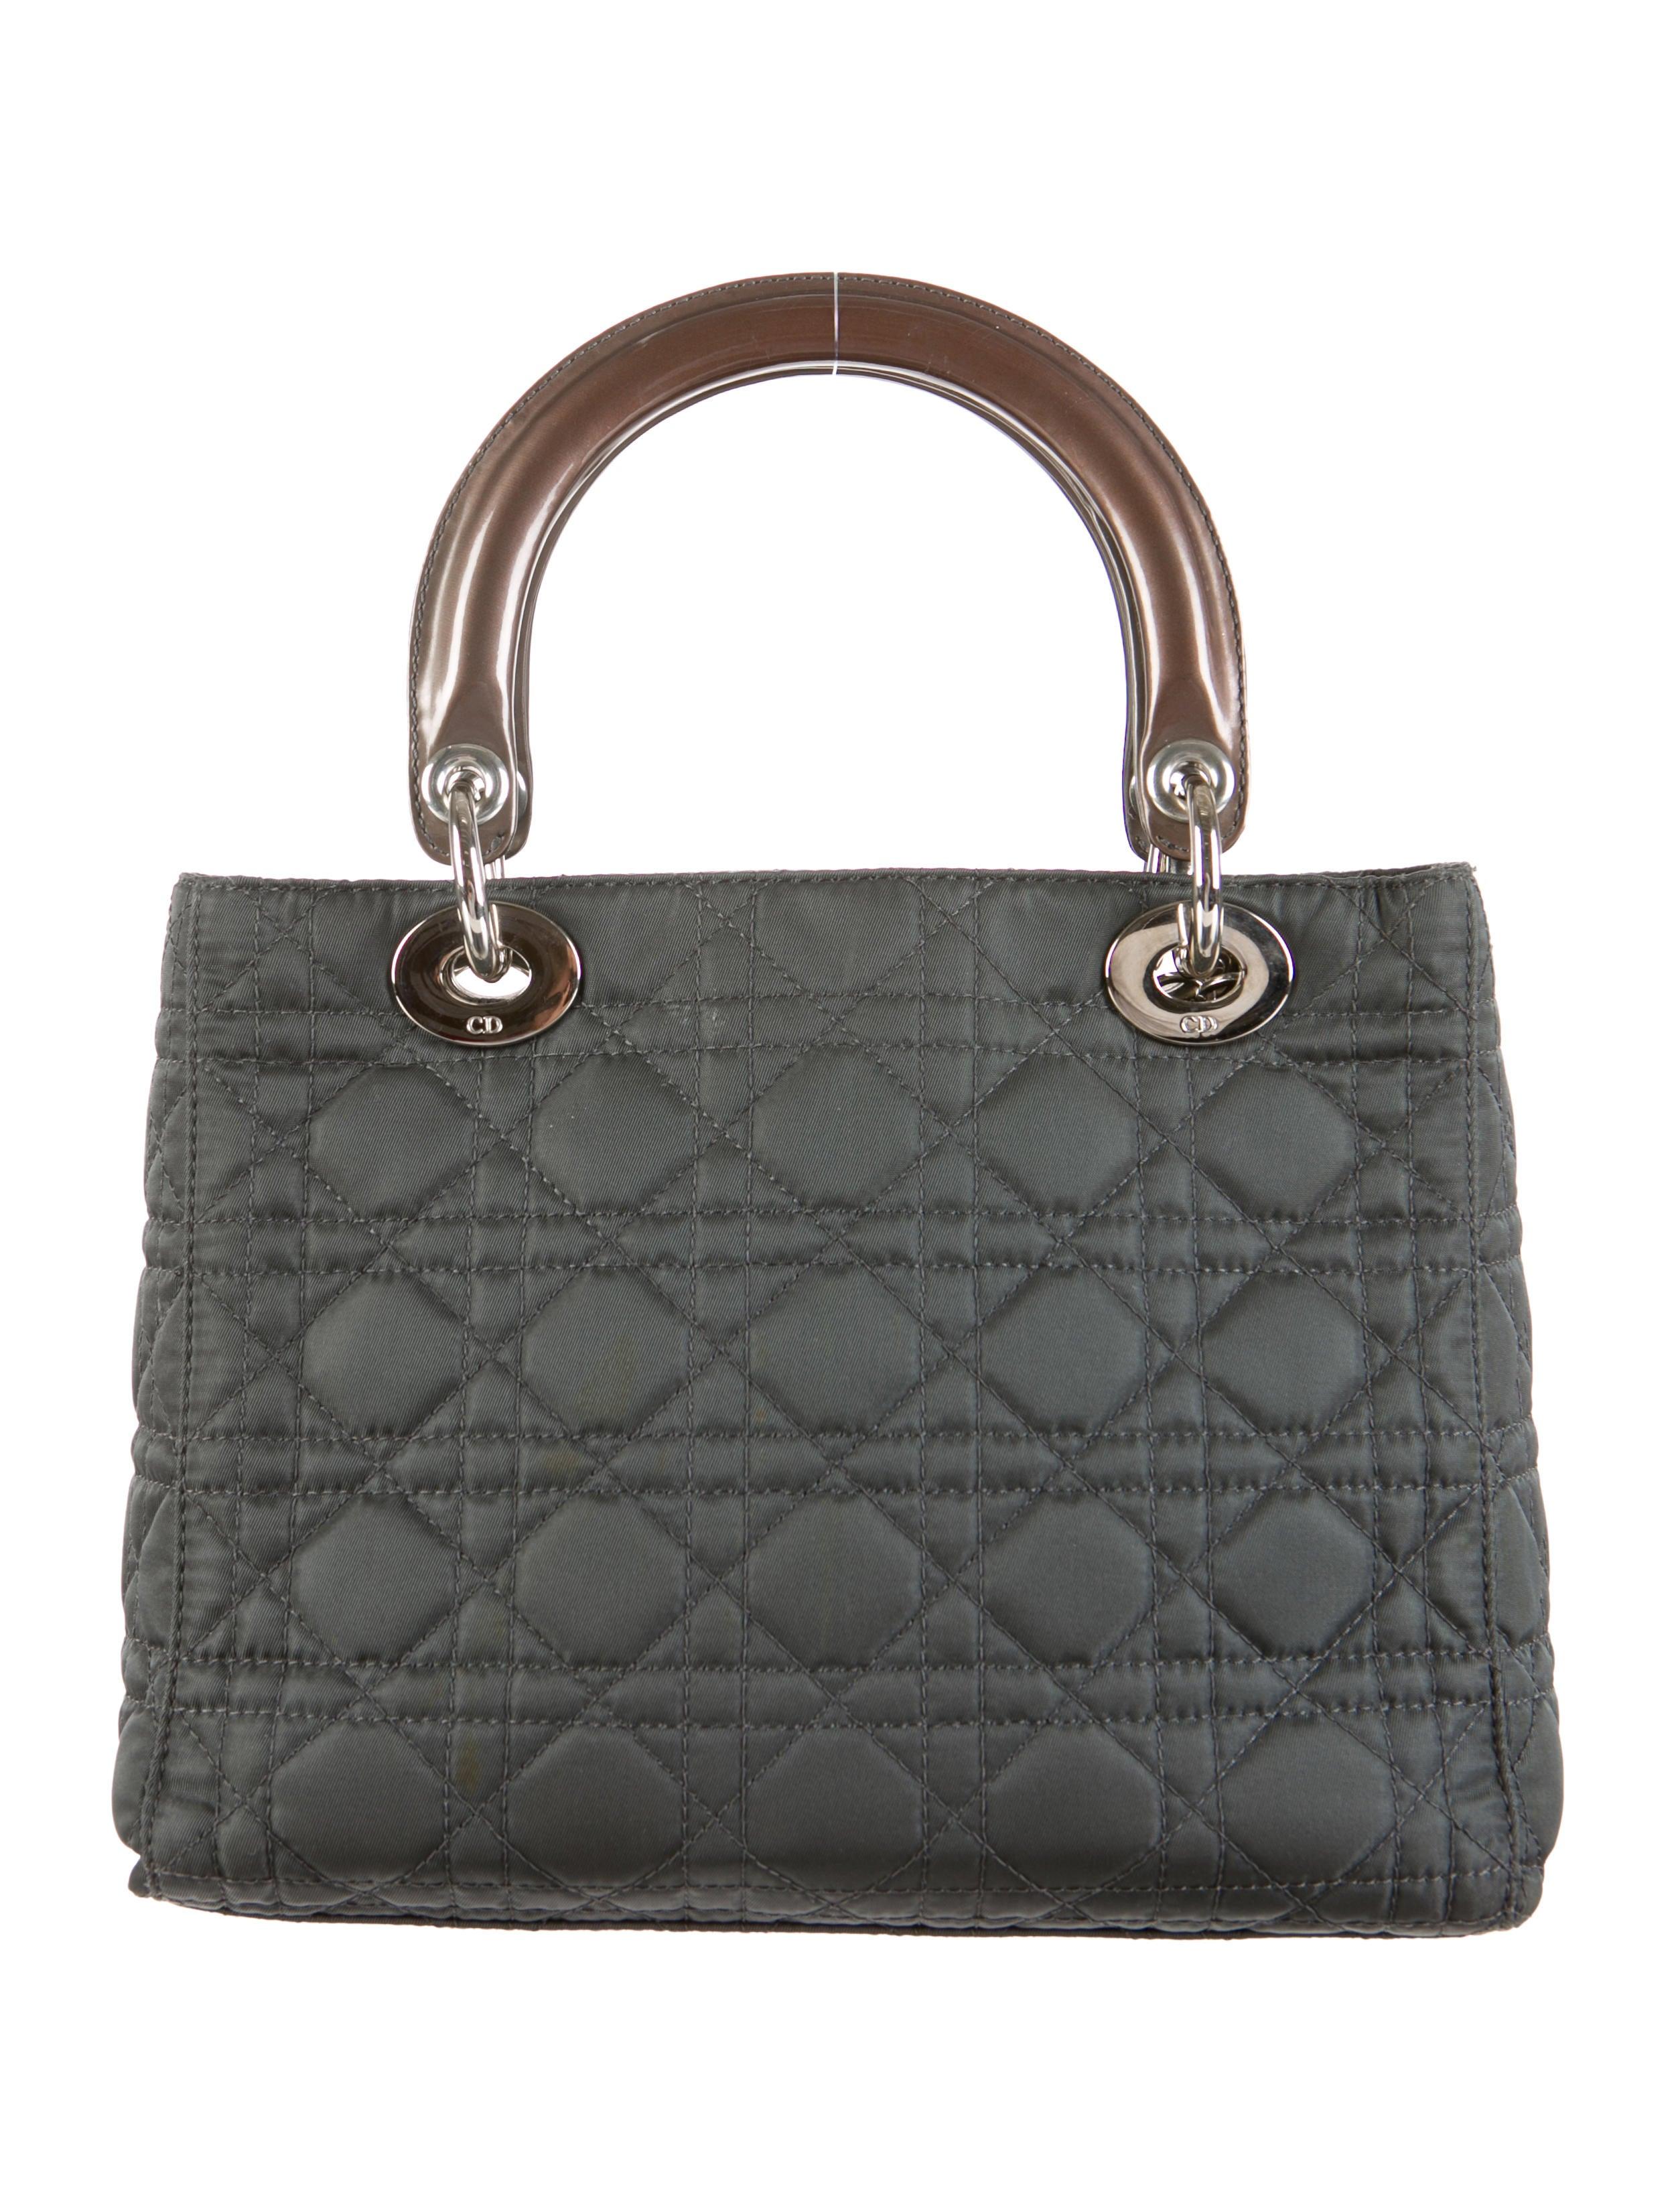 Christian Dior Medium Lady Dior Bag Handbags Chr31948